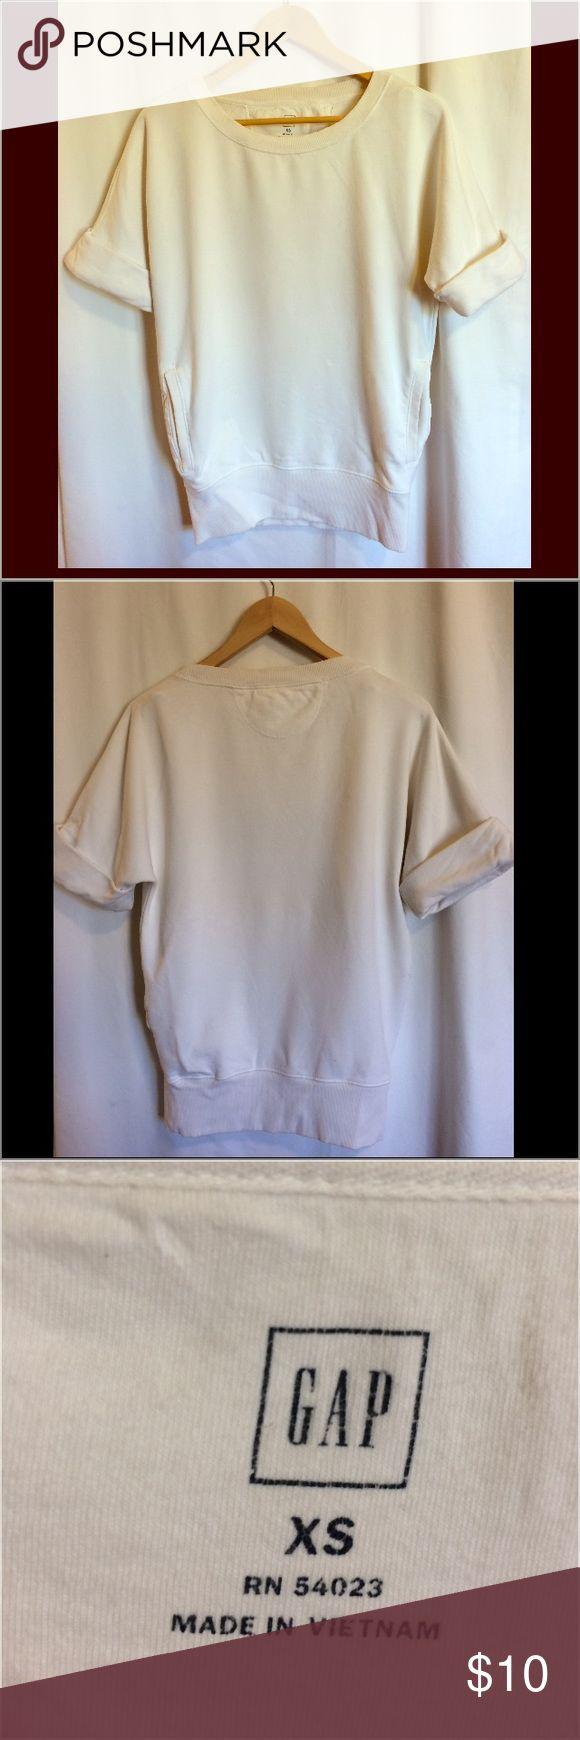 Gap Short Sleeved White Sweatshirt Short sleeved, white sweatshirt by Gap. Size XS fits up to size 6. Has pockets. GAP Sweaters